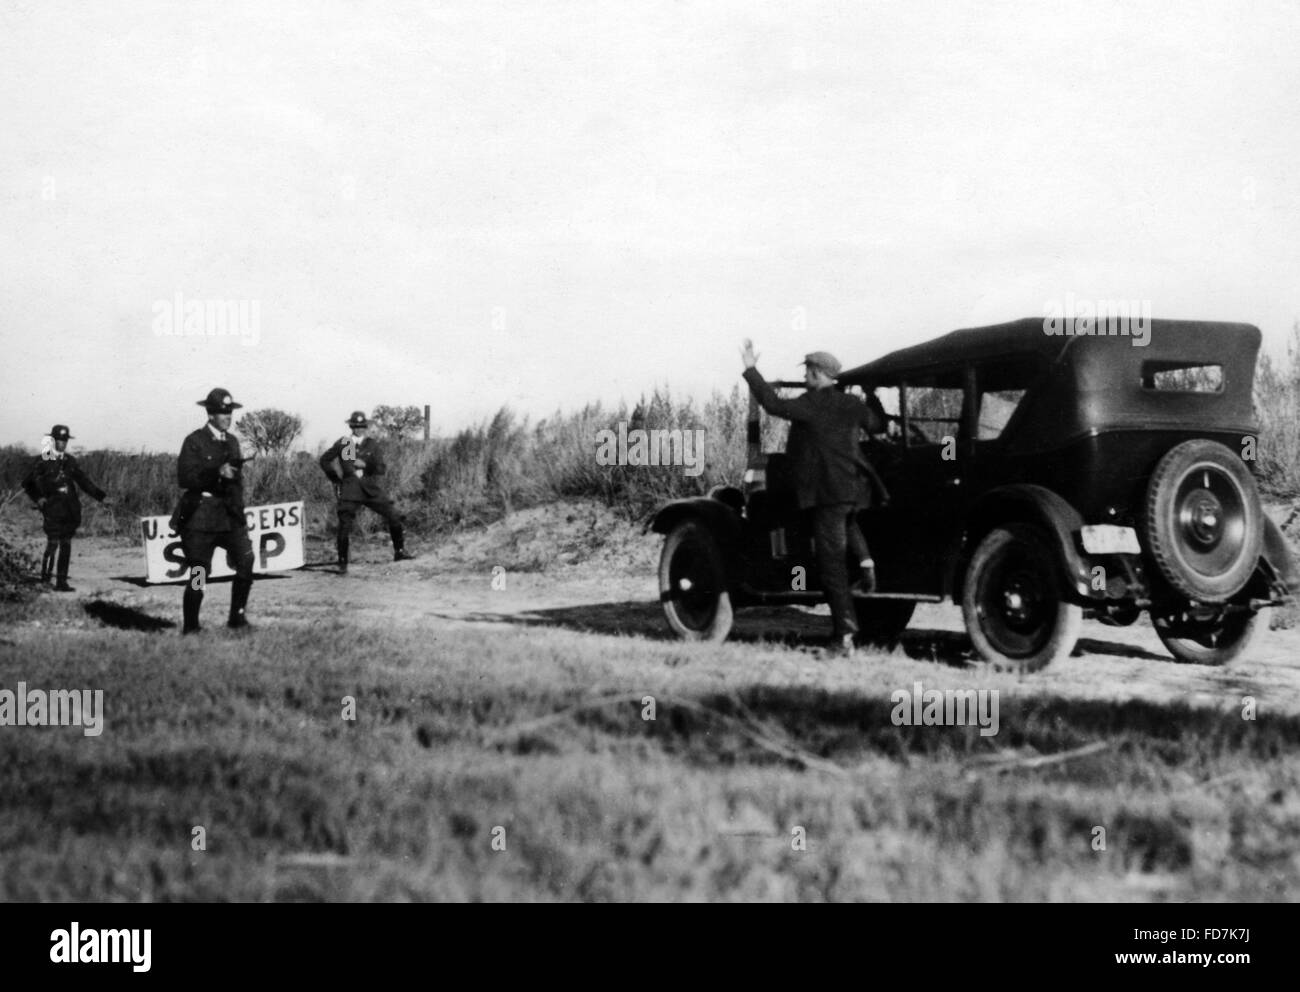 Verbot: Schmuggler an der Grenze Texas-Mexiko, 1927 Stockbild